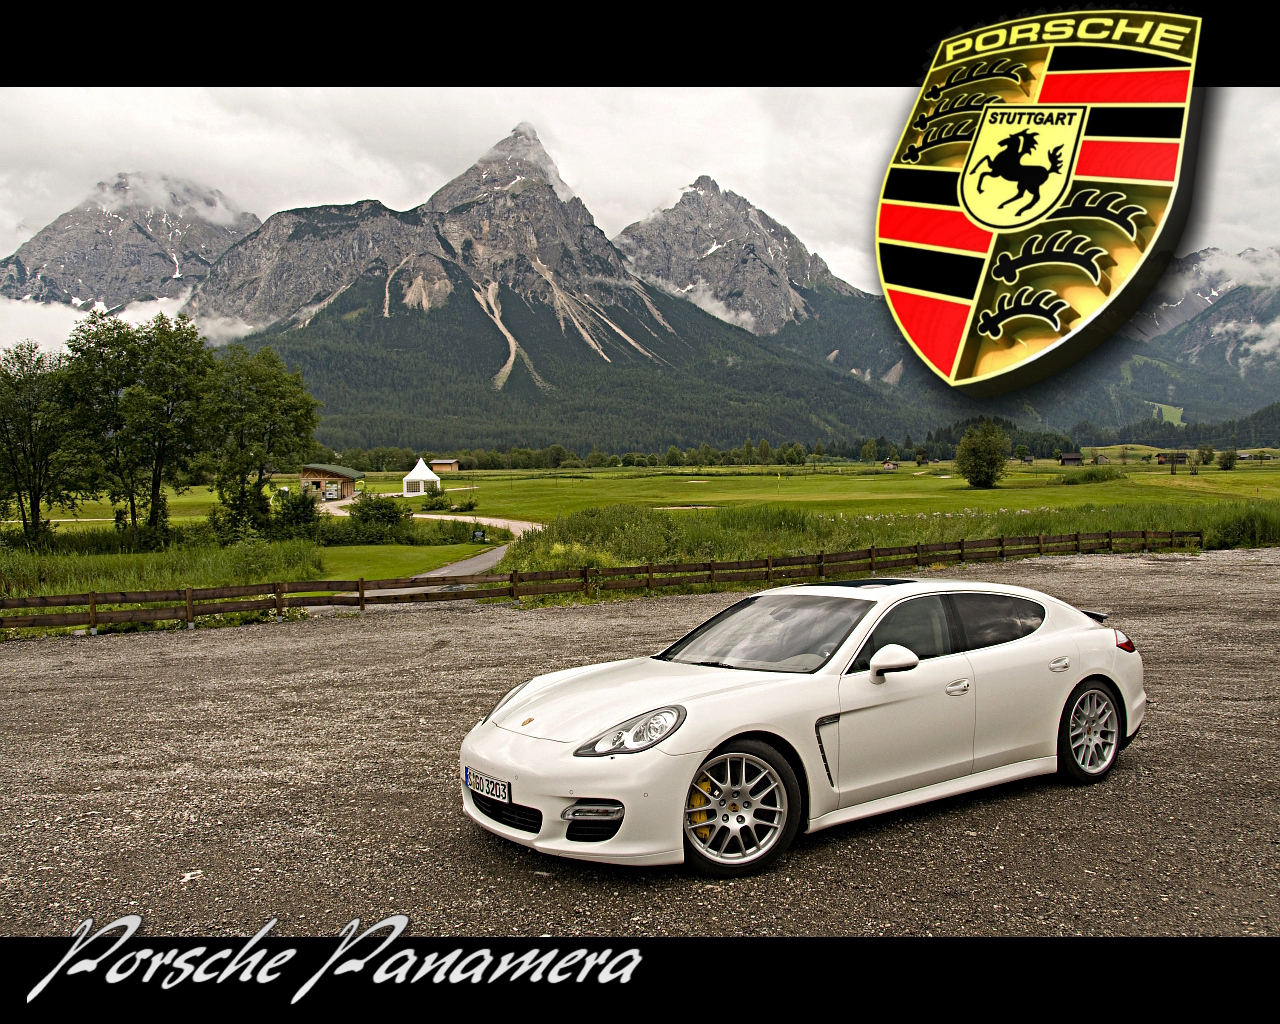 4-drzwiowe 911 – Porsche Panamera